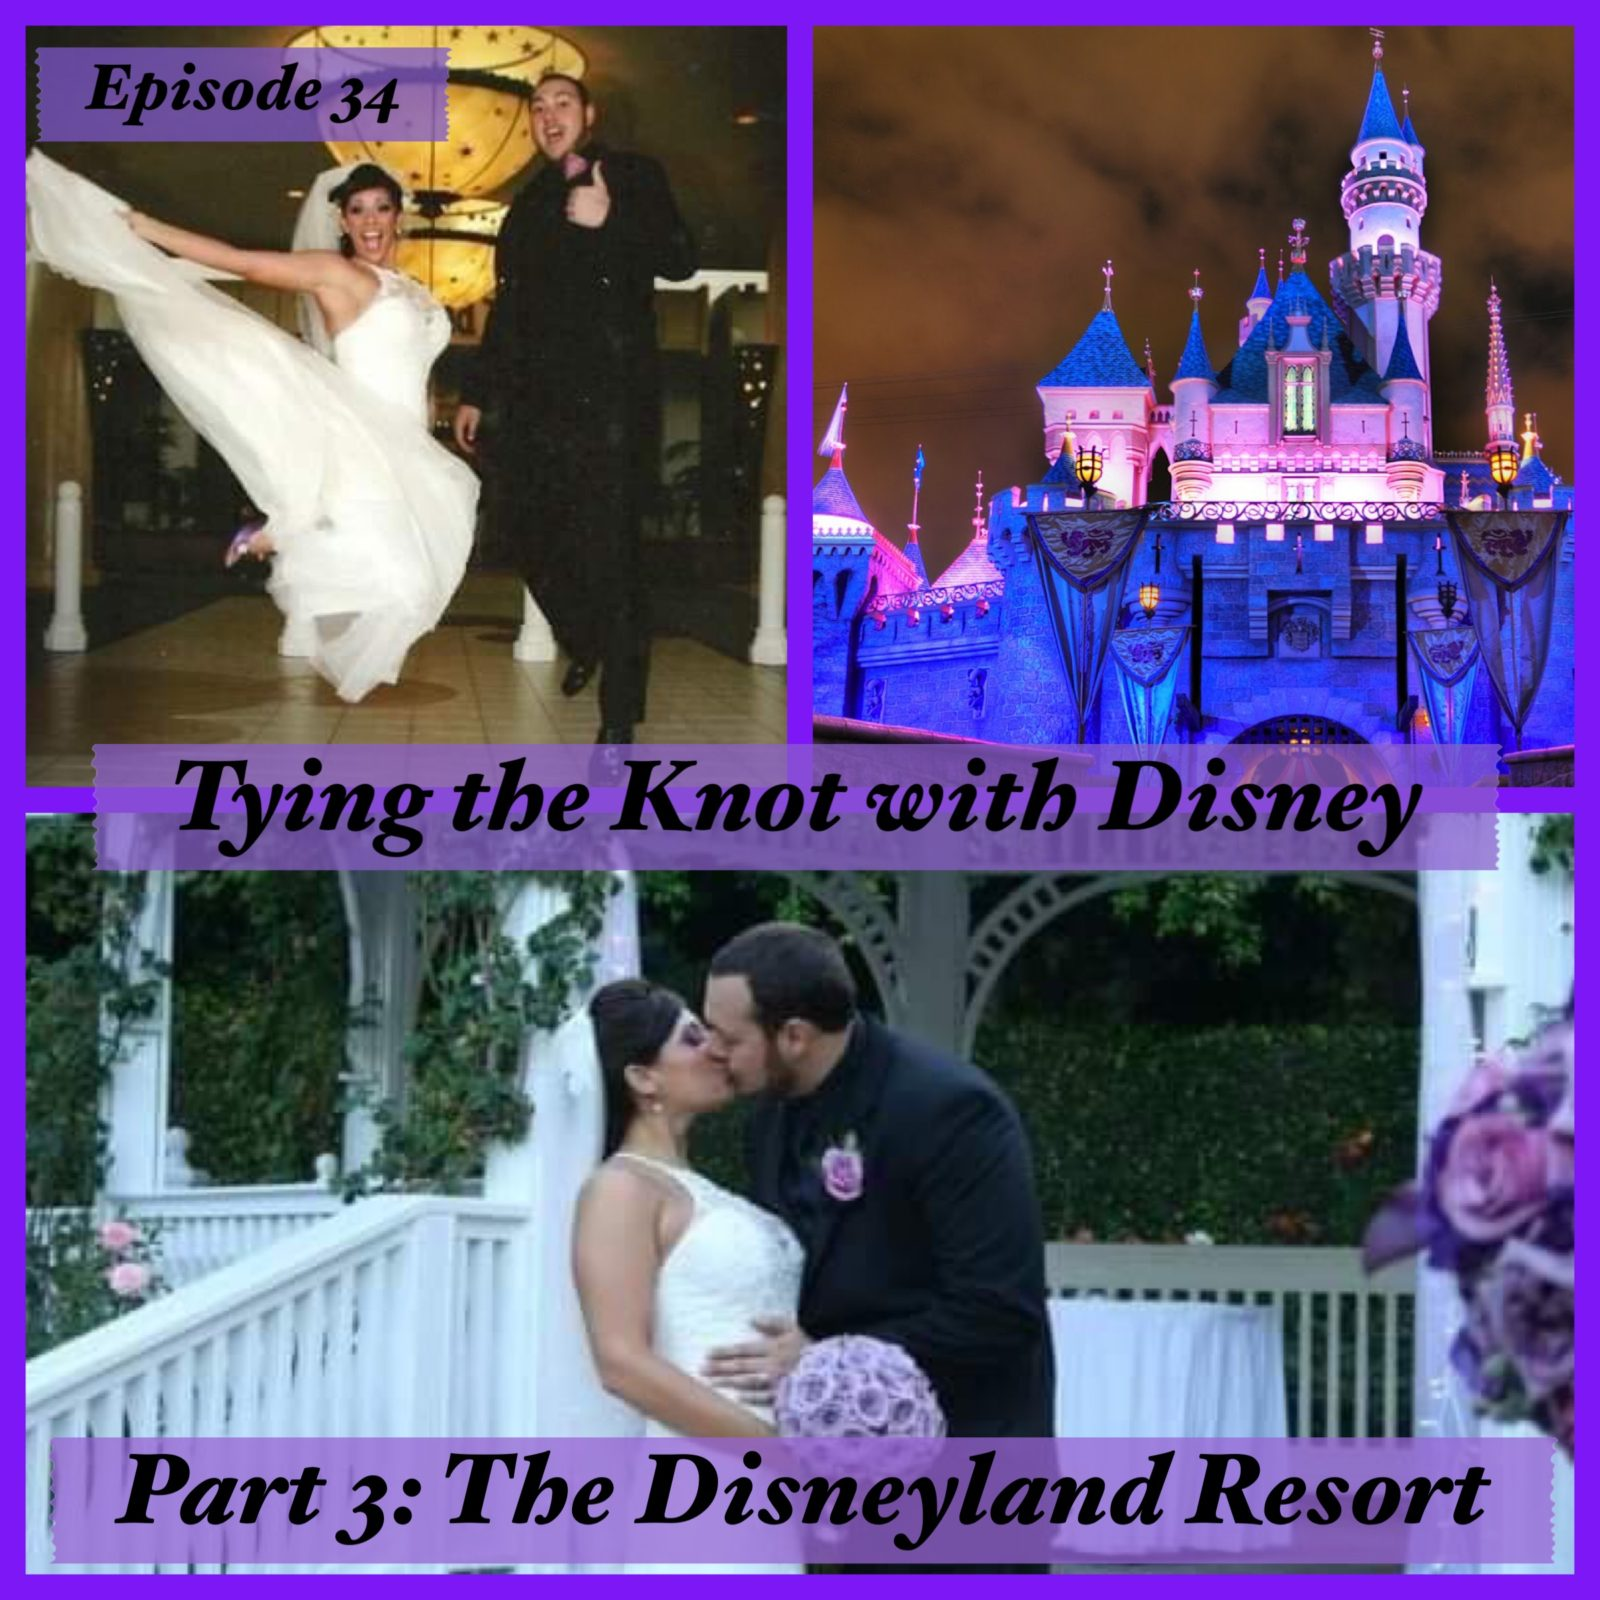 Tying the Knot with Disney - Disneyland Weddings